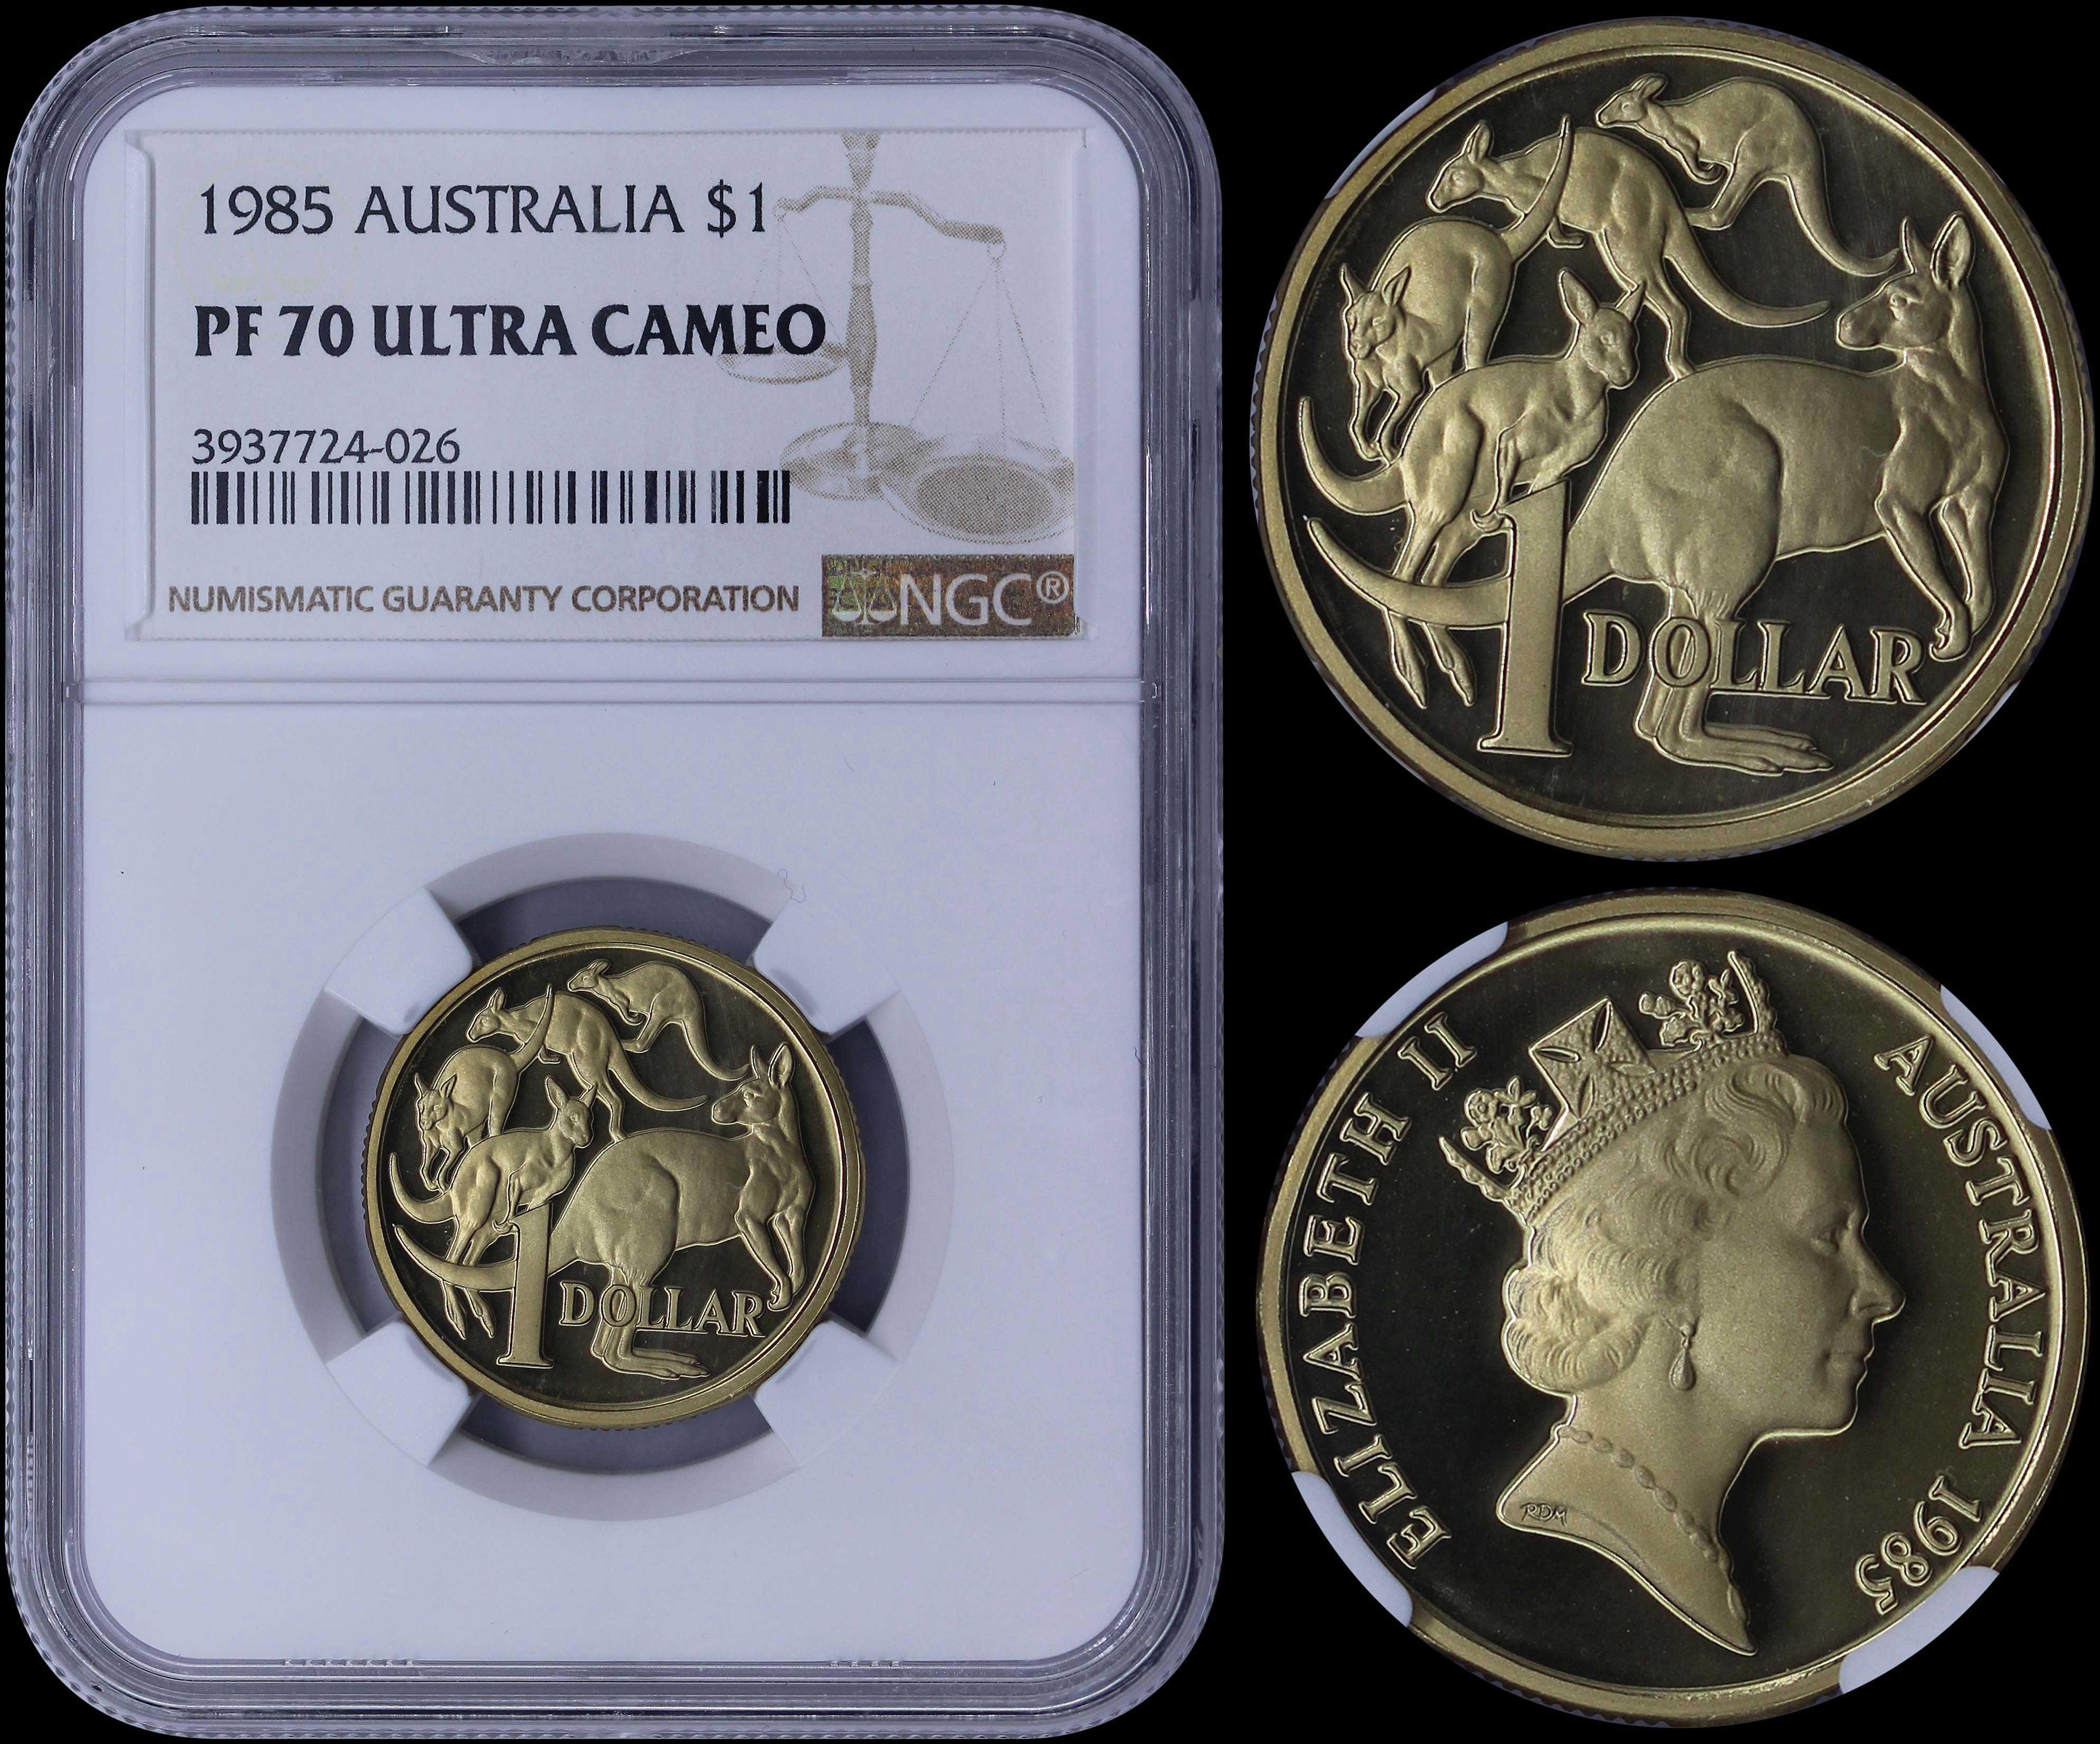 2019 Australia GILDED Silver Lunar Year of the PIG NGC MS 70 1oz Coin ER GILT